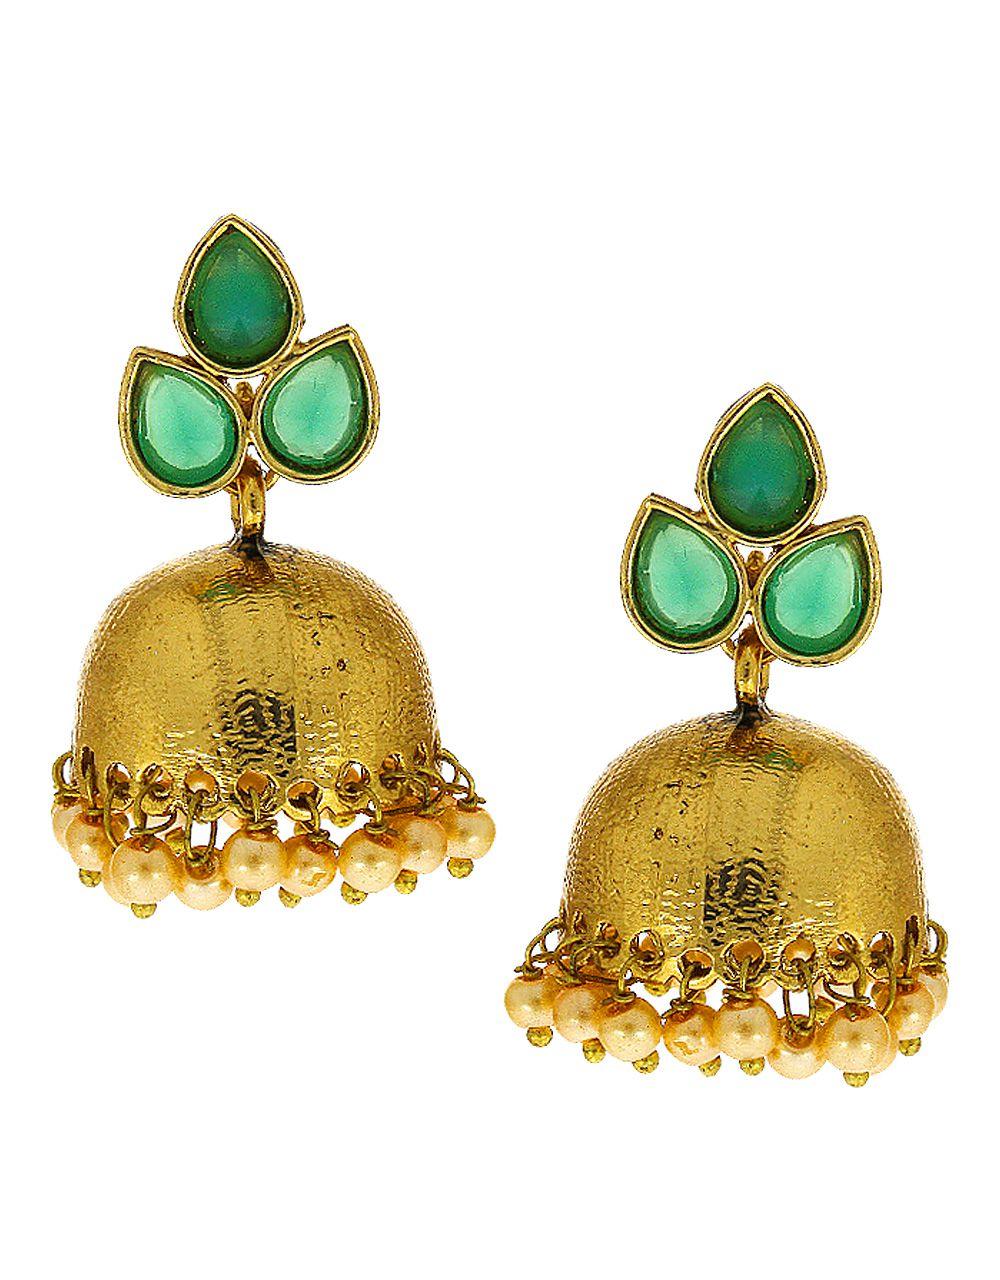 Anuradha Art Green Colour Pearl Beads Droplet Styeld Very Pretty Adorable Designer Traditional Jhumki/Jhumkas Earrings For Women/Girls